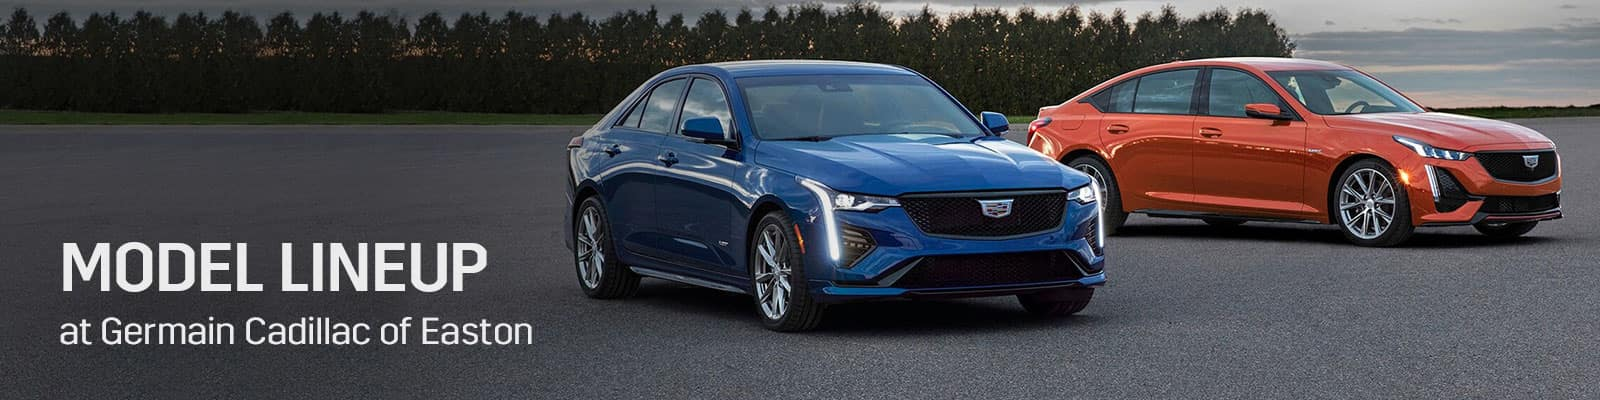 New Cadillac Car and SUV Model Lineup